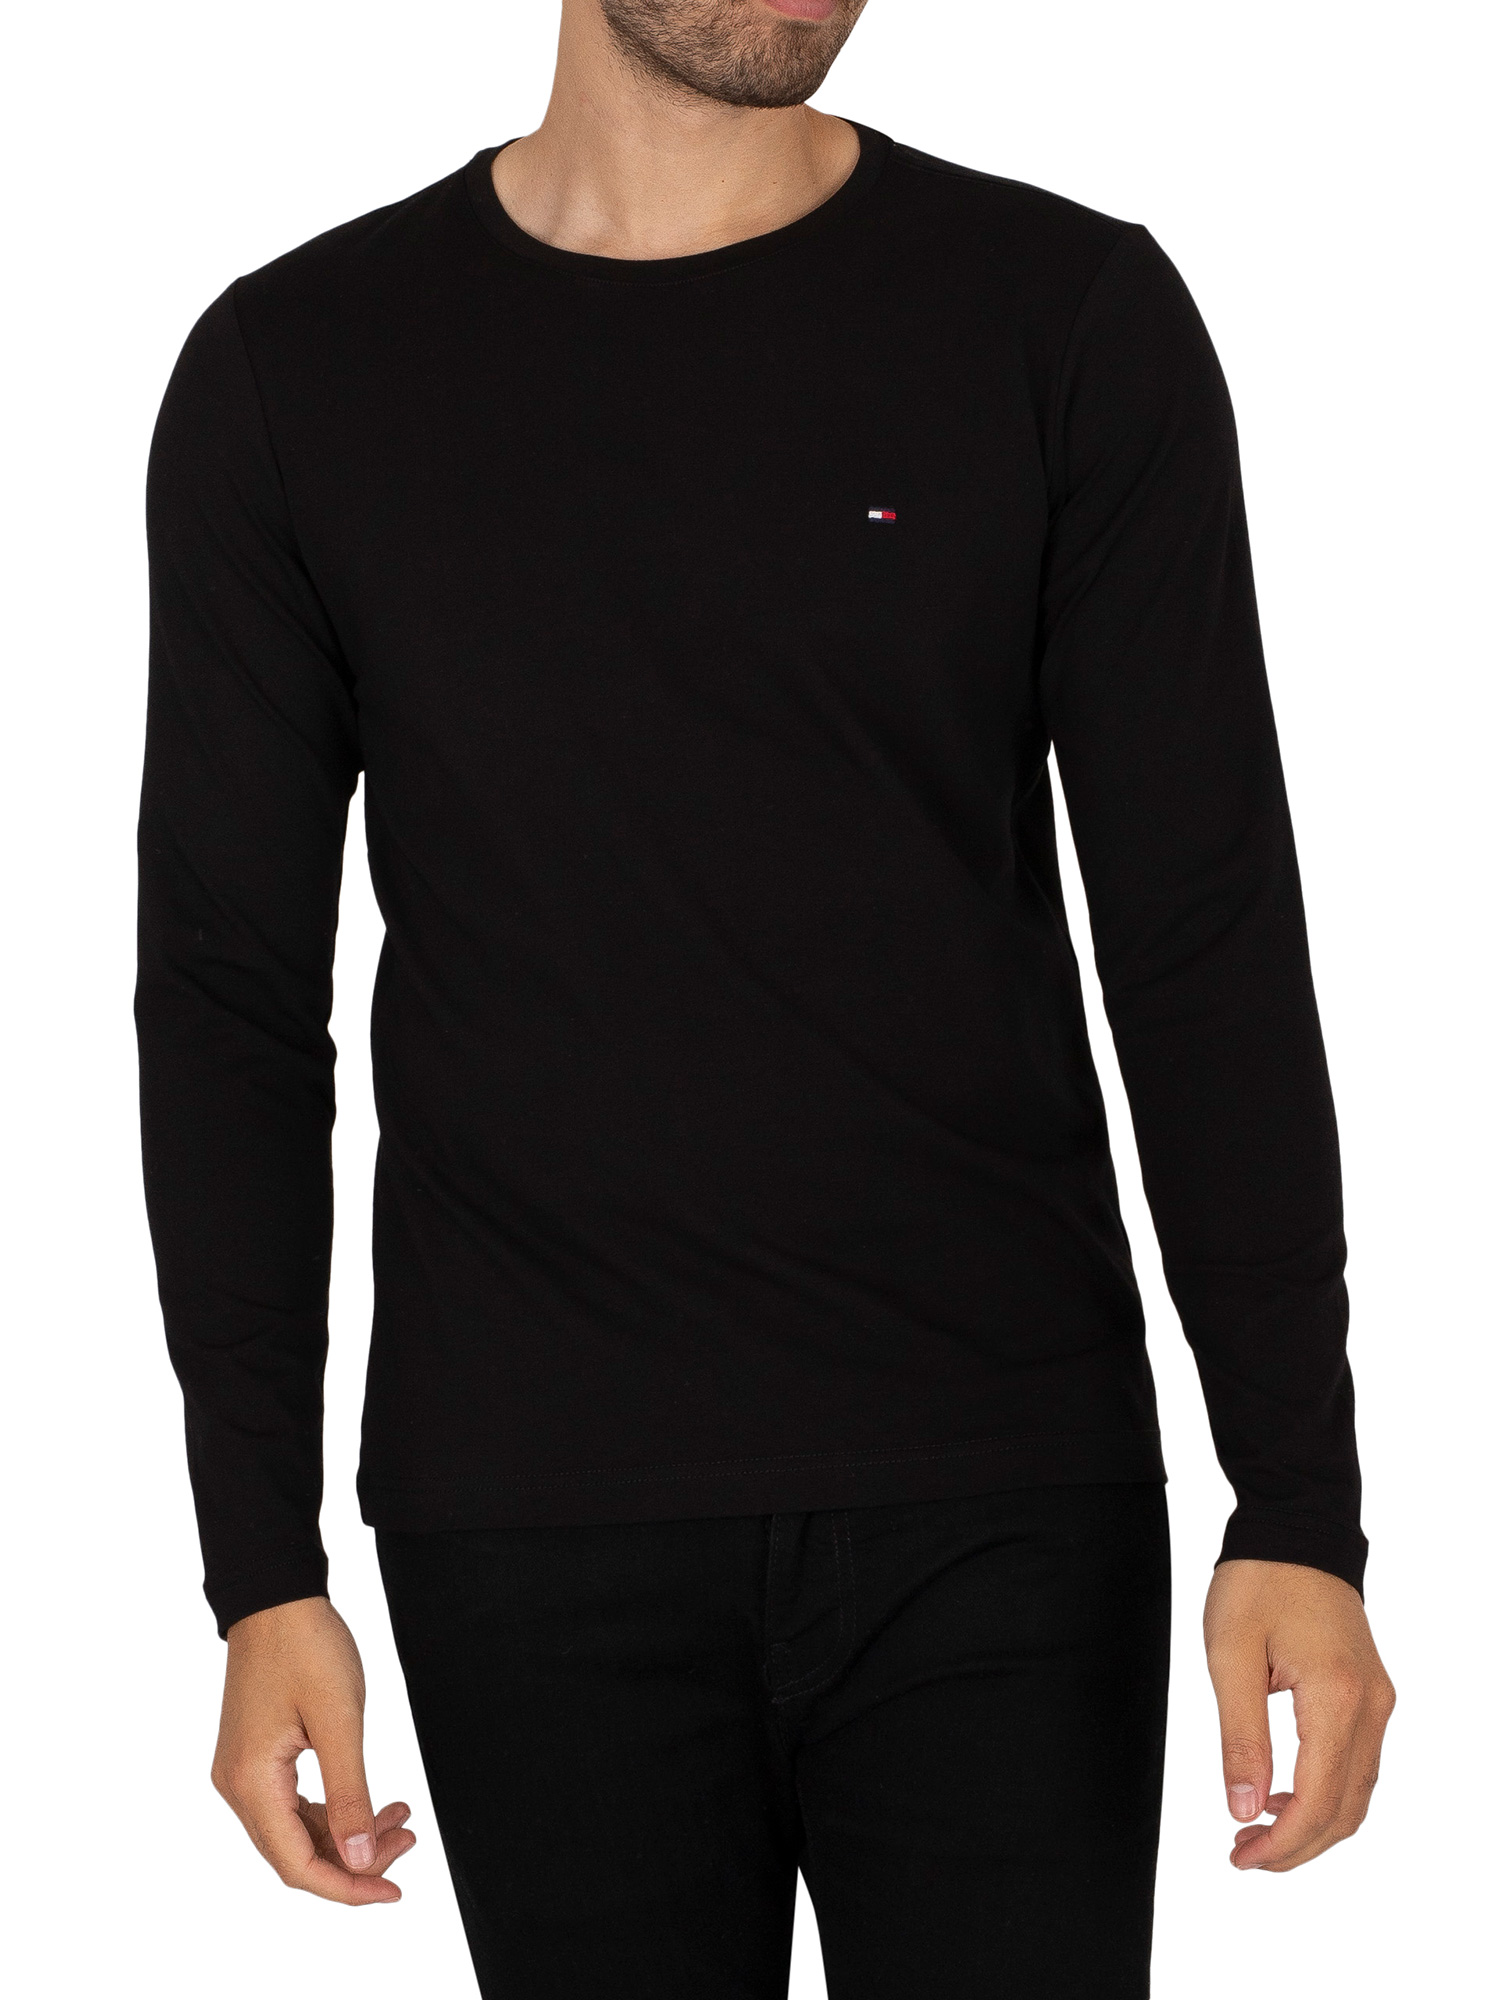 Stretch Slim Fit Longsleeved T-Shirt